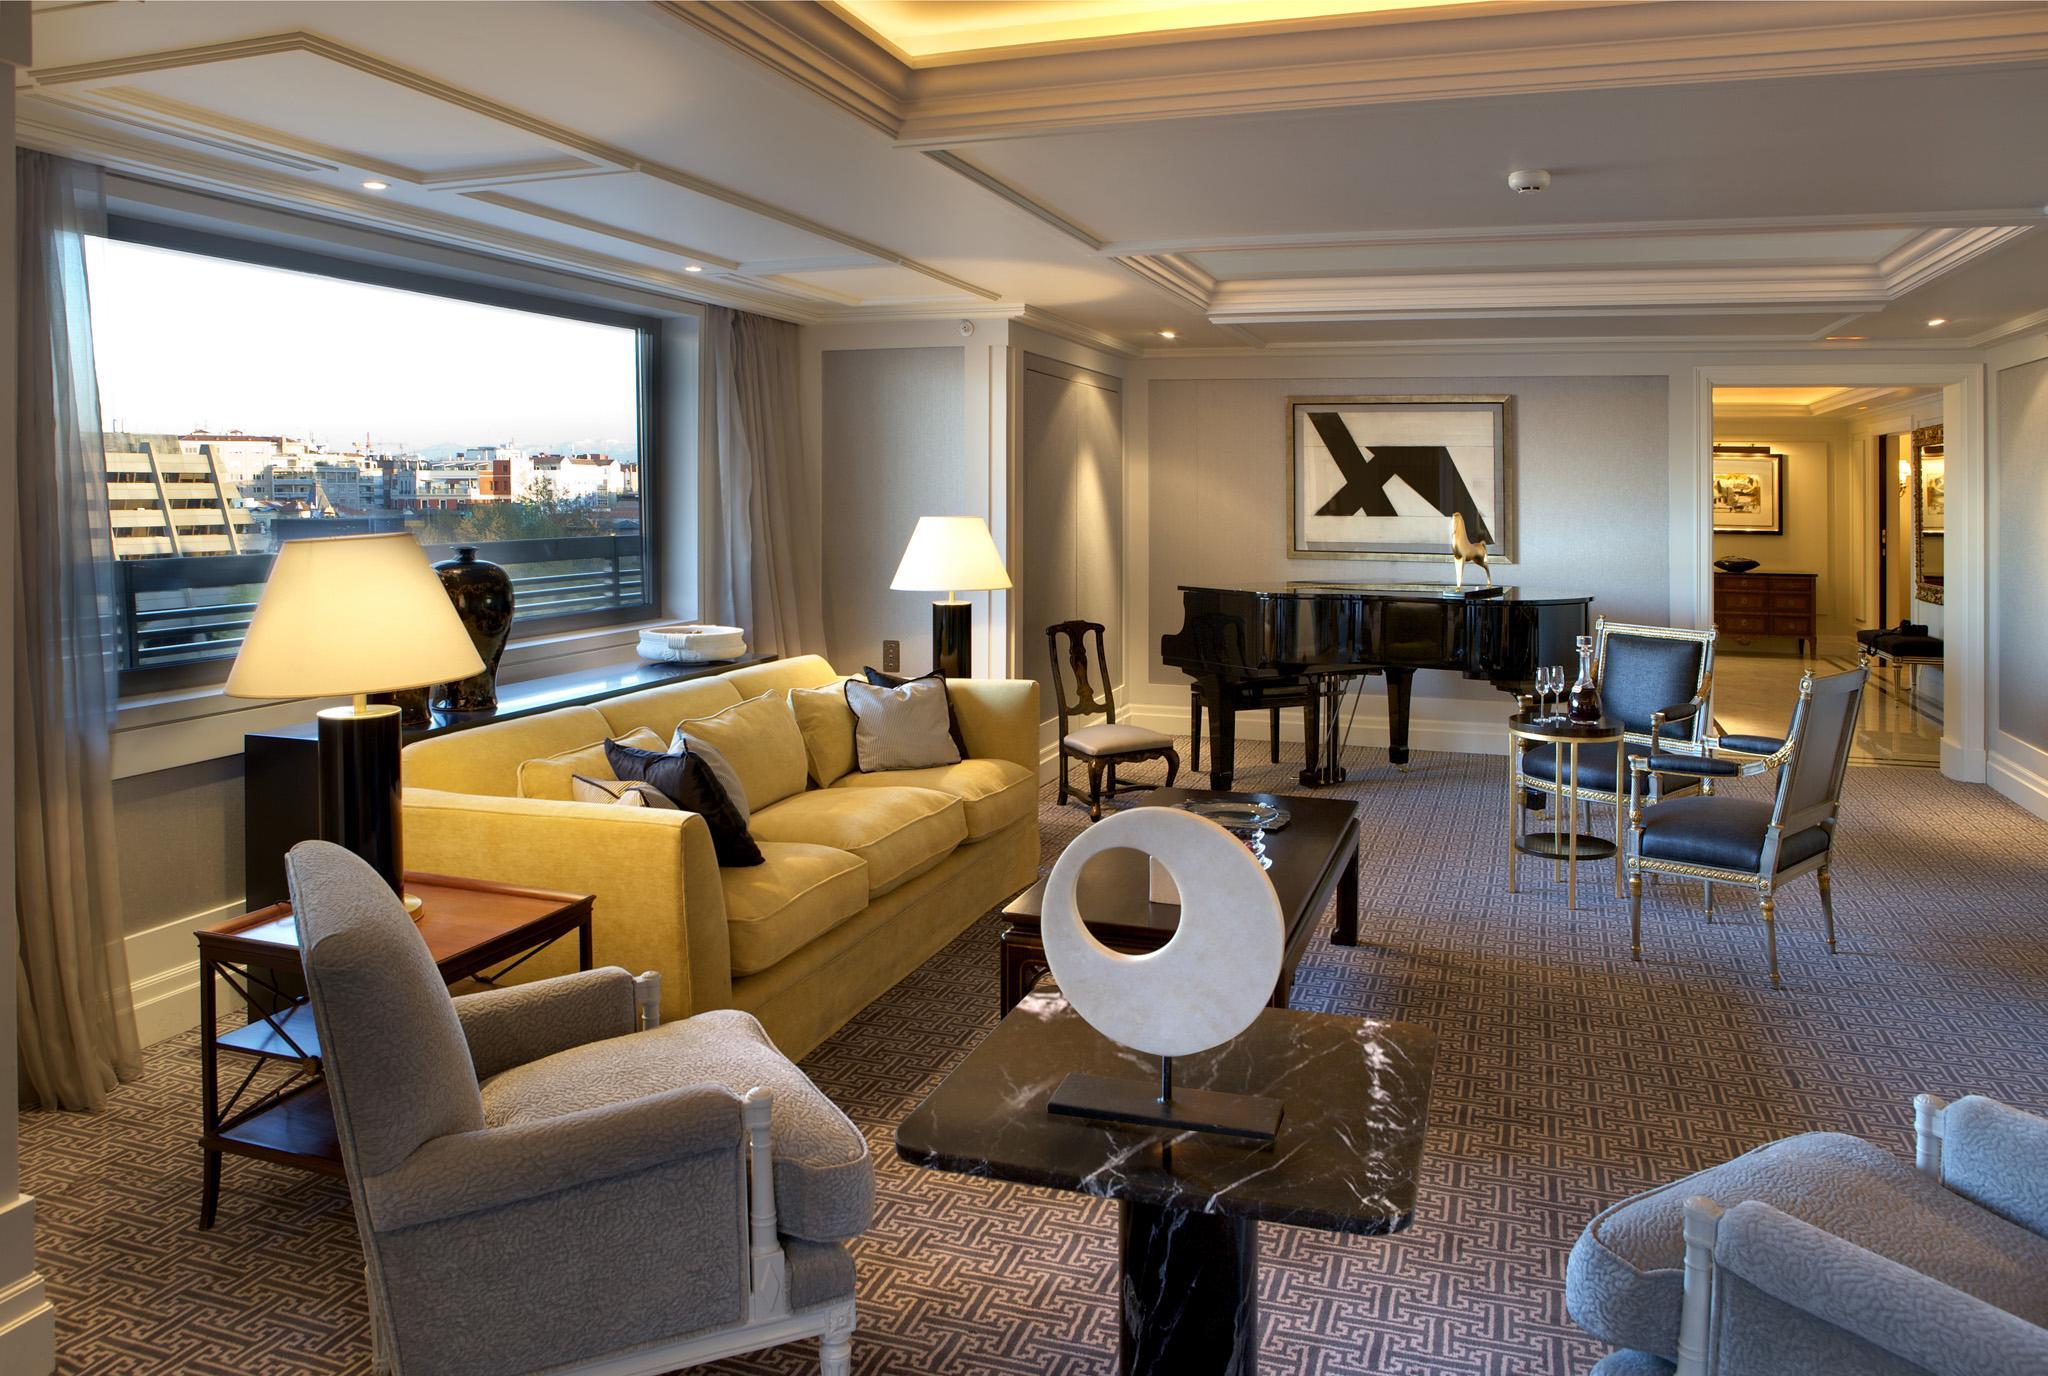 Suite Real Hotel Villa Magna, Madrid